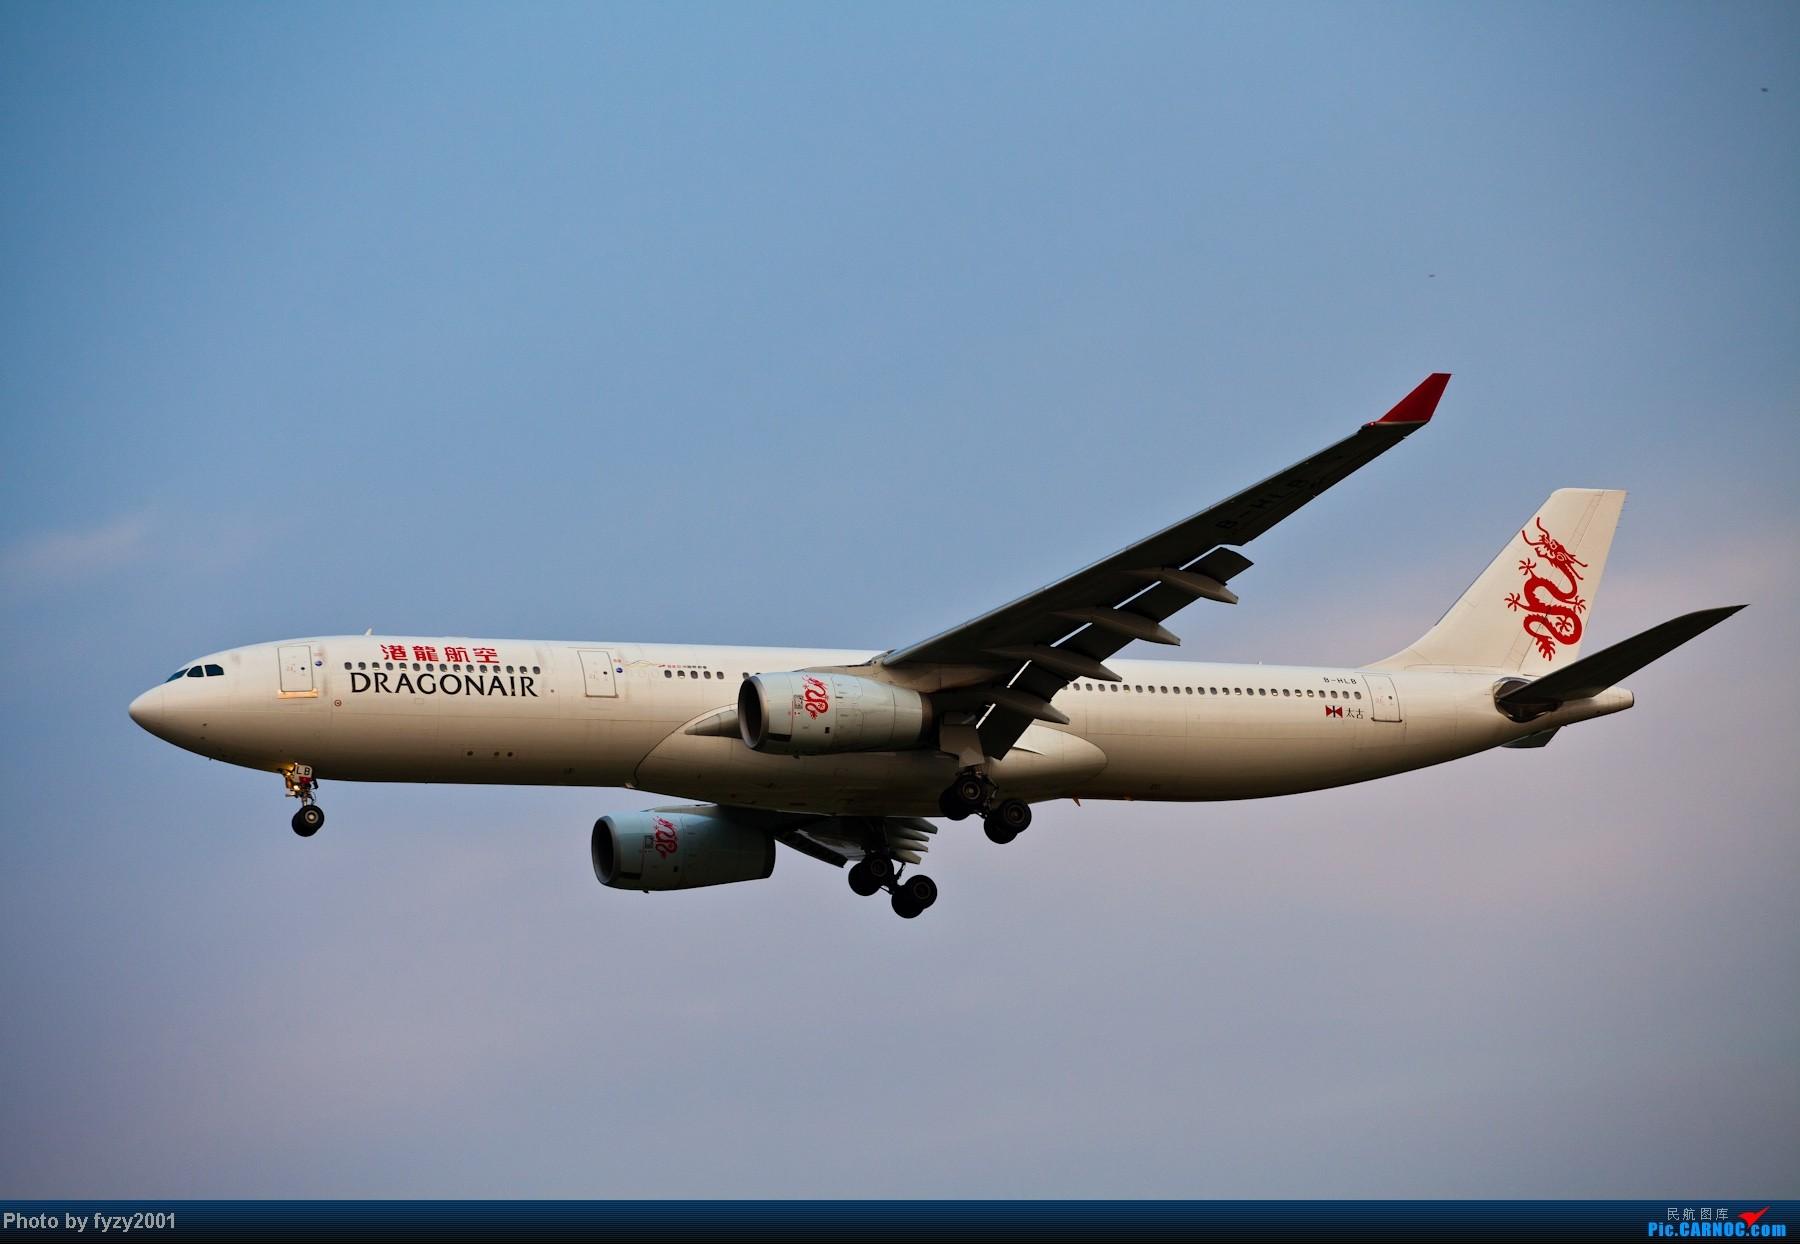 Re:[原创][无锡西站]长假PVG蹲守~~~~只发大图,多图杀猫~~~~ AIRBUS A330-300 B-HLB 中国上海浦东机场